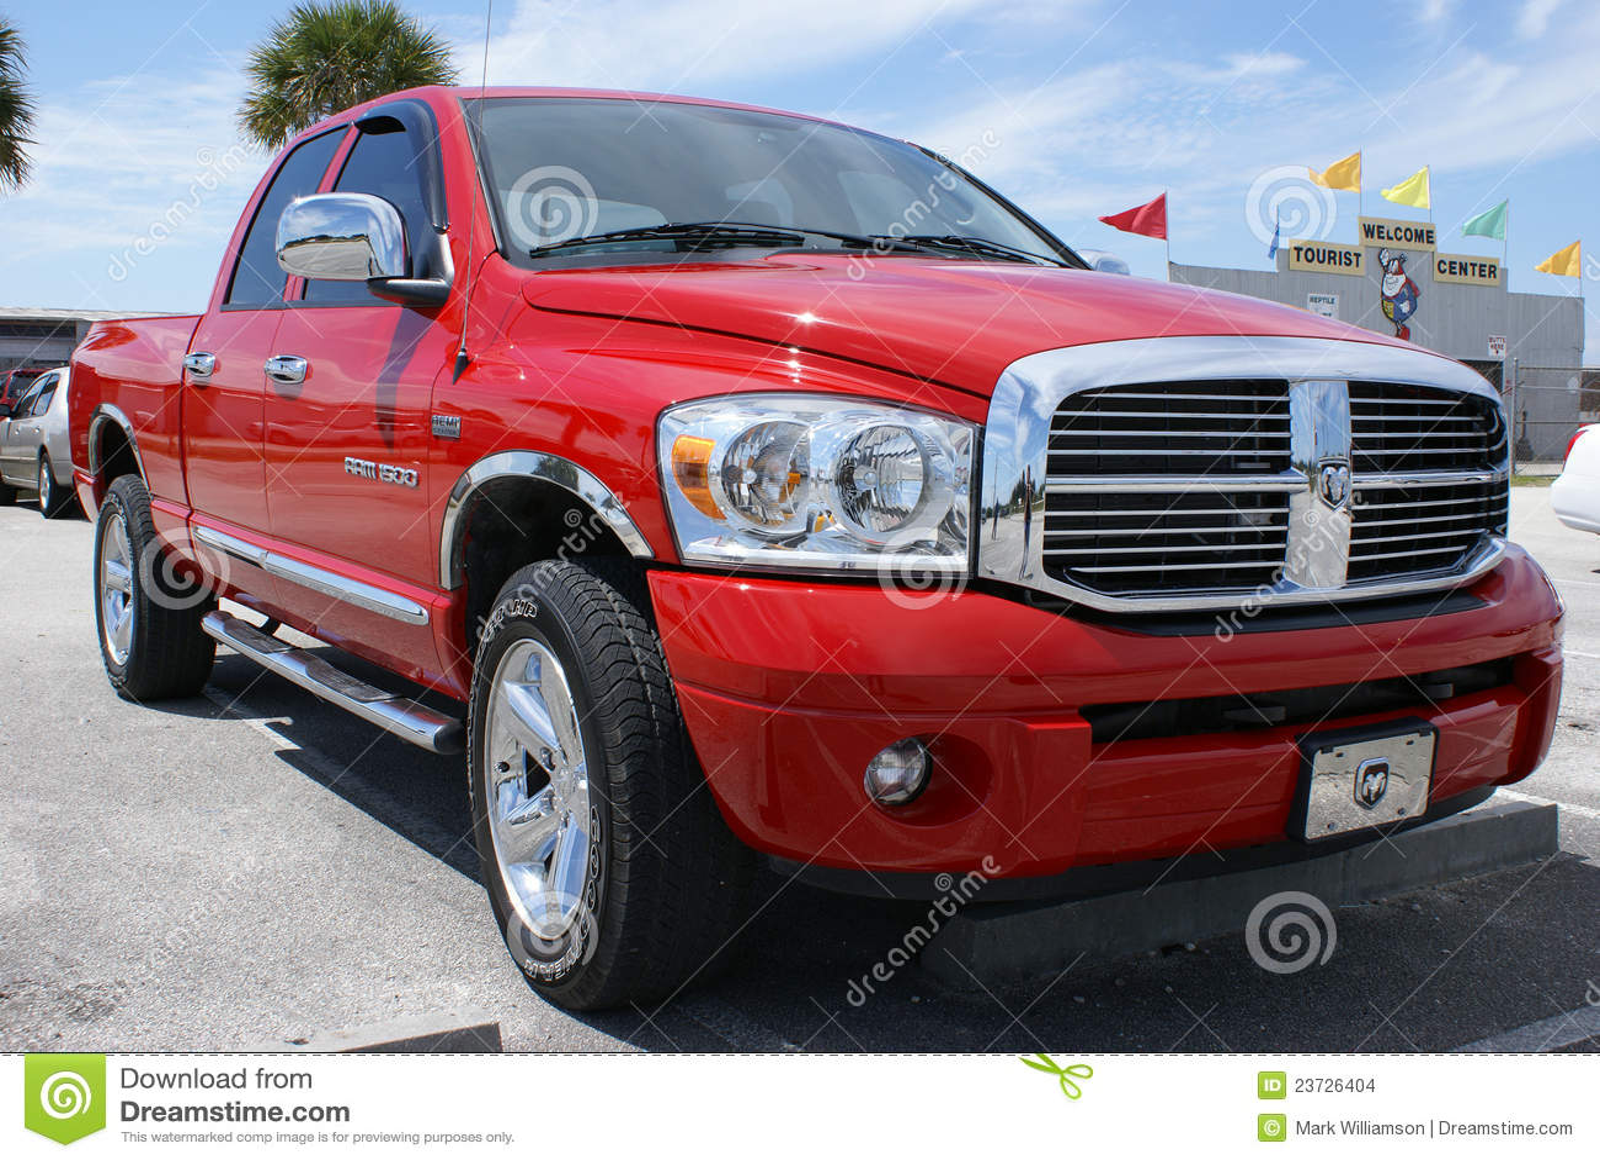 Dodge Ram 1500 in Florida